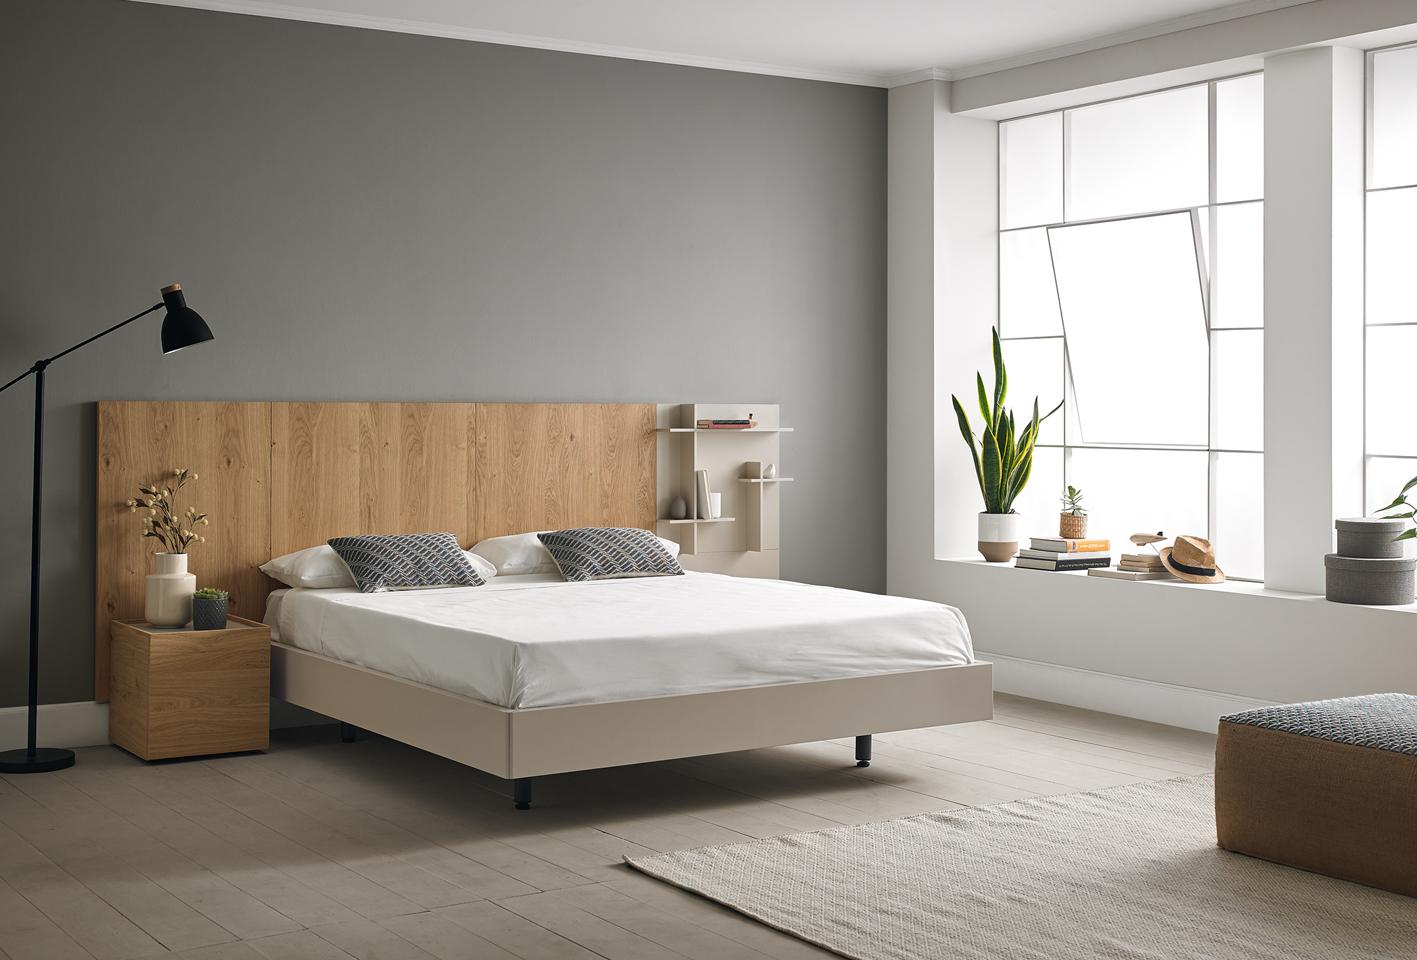 dormitorio-moderno-mobenia06